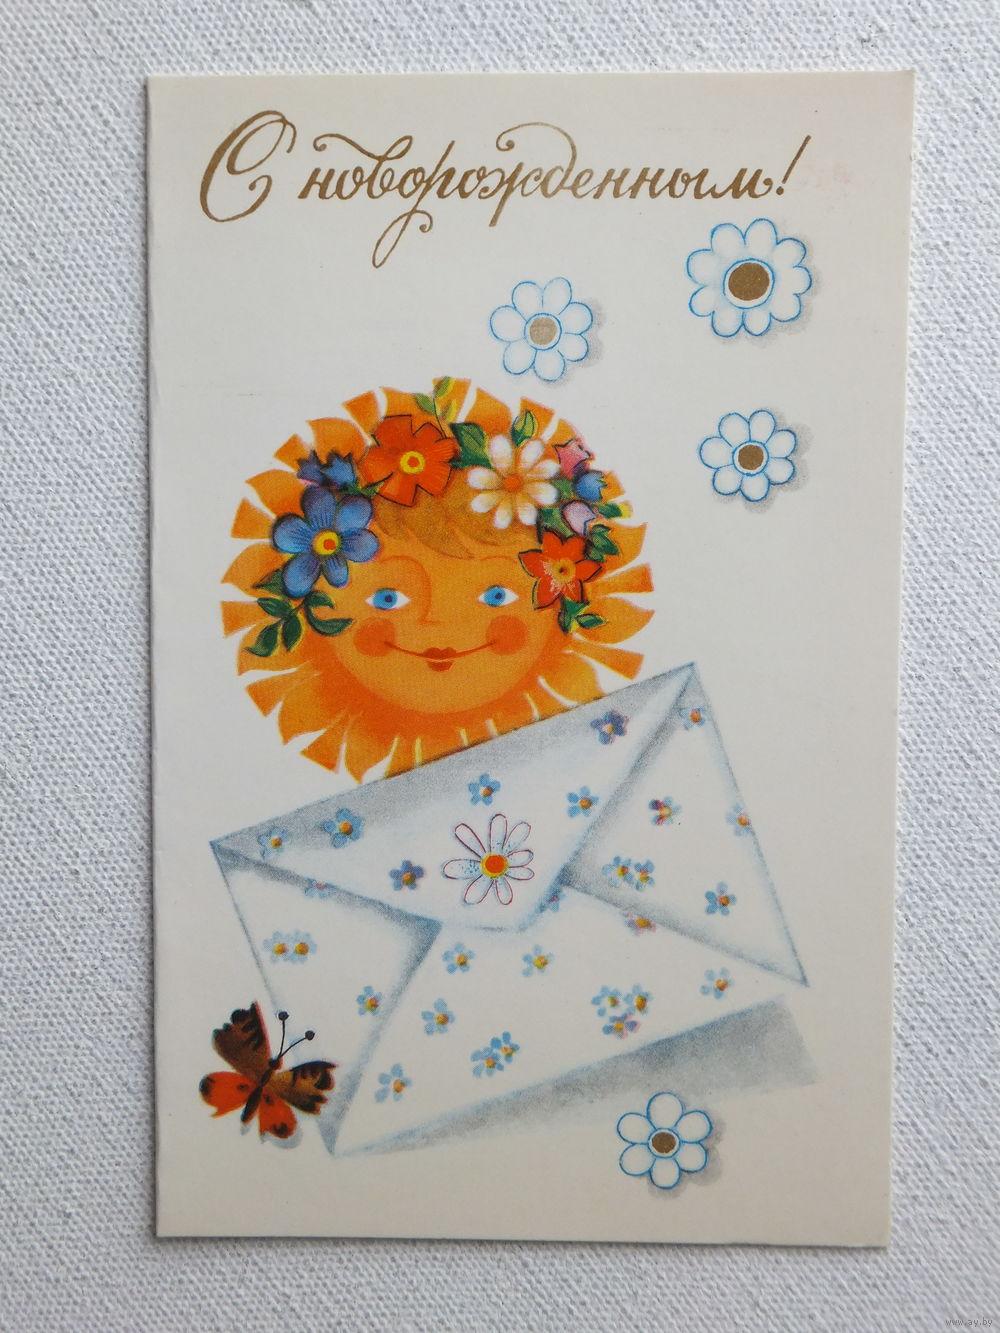 Шаблоны открыток на фотодекор